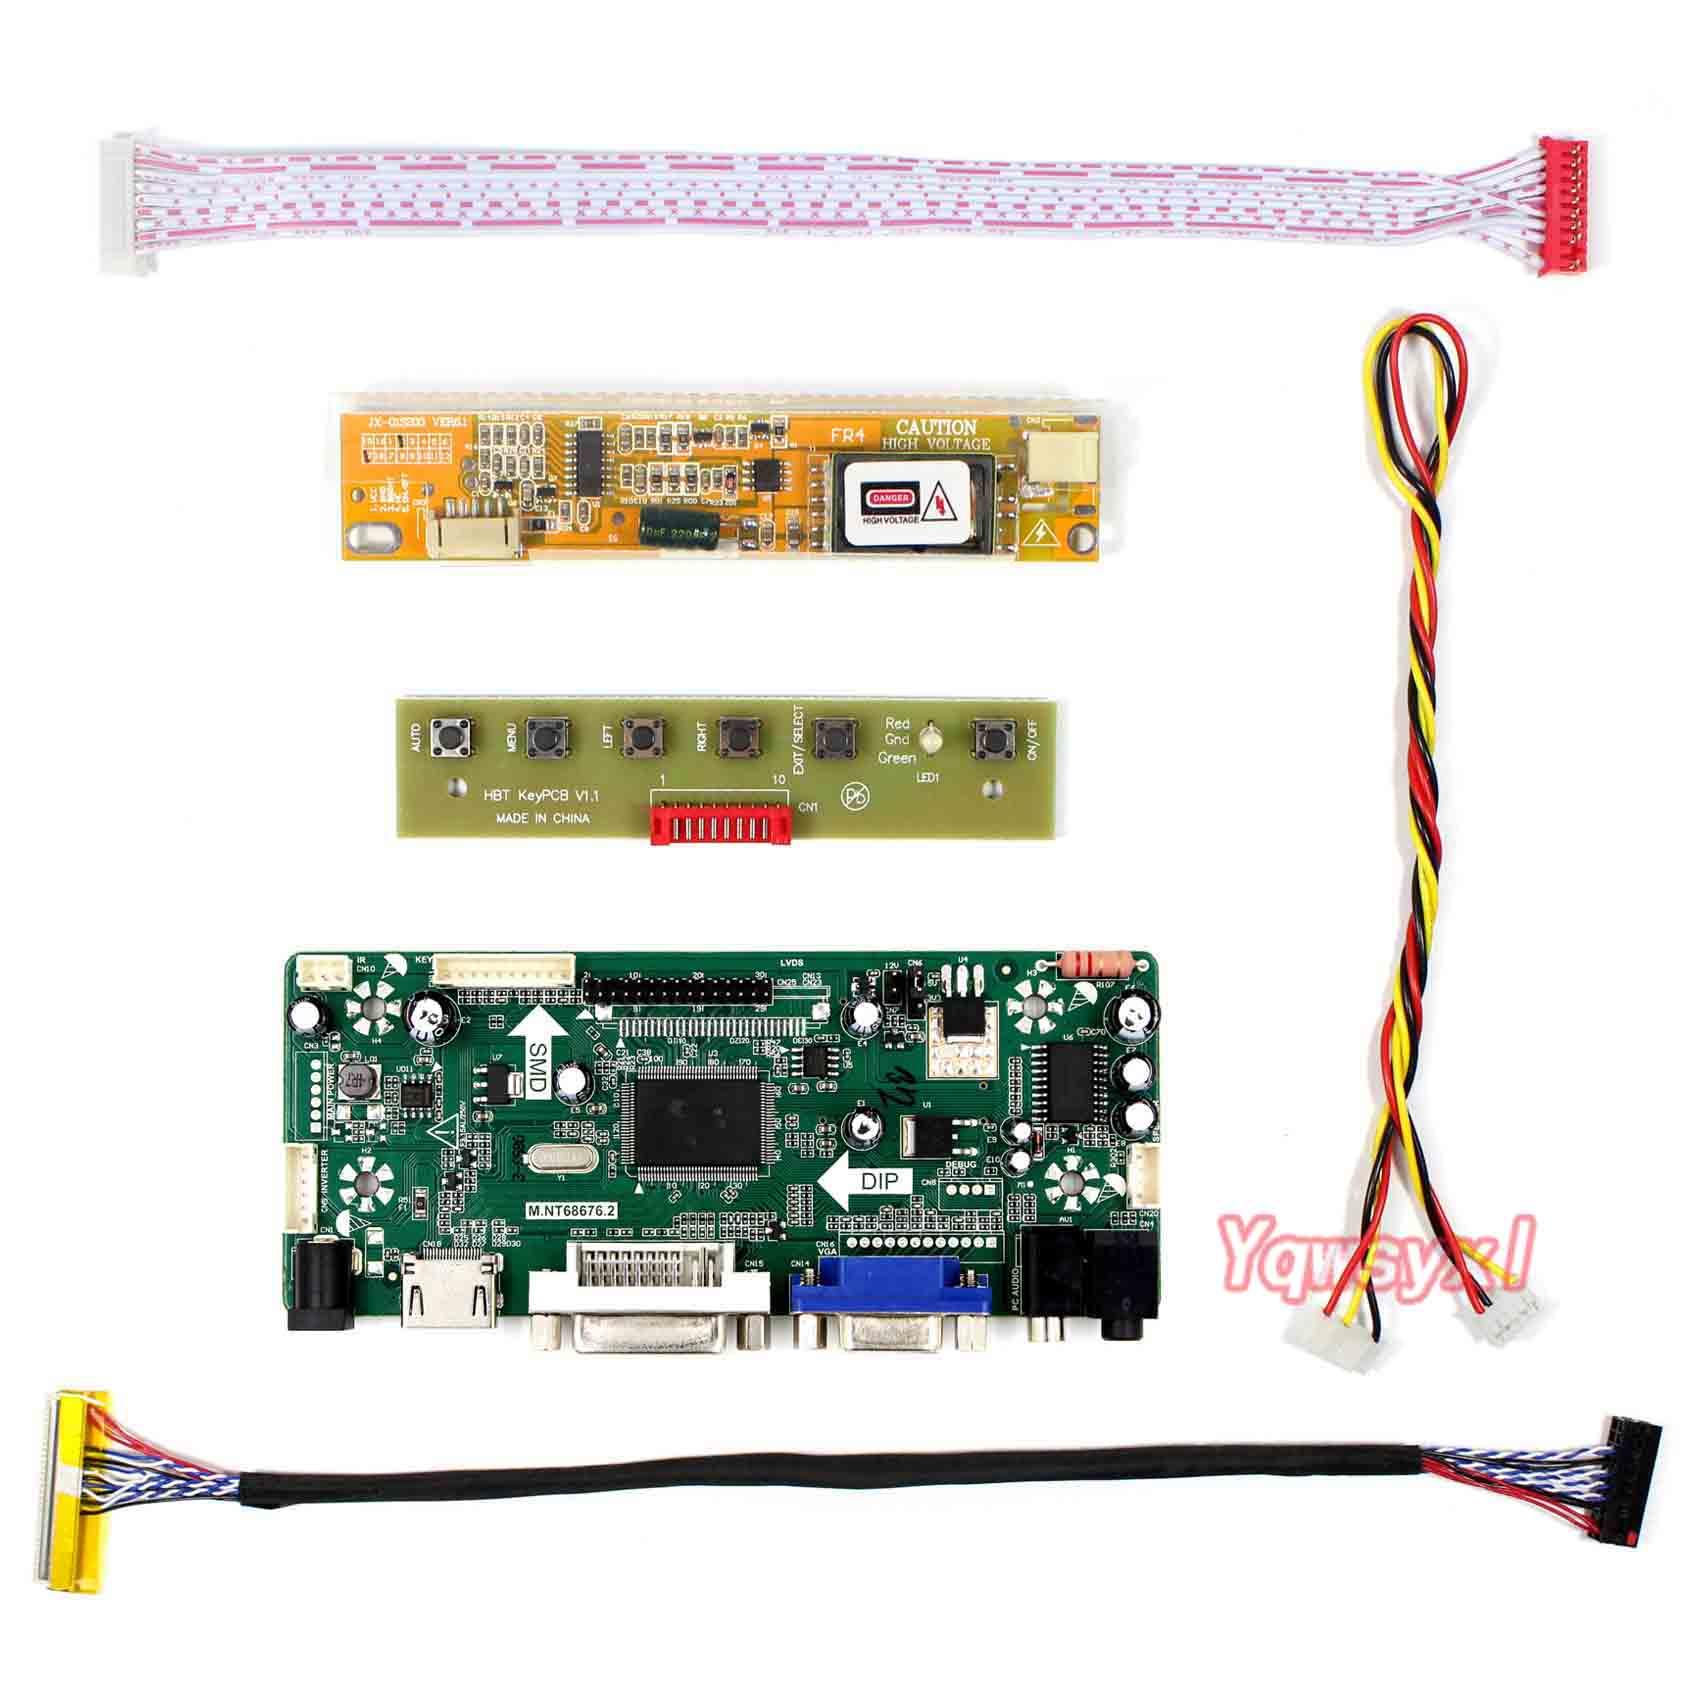 Yqwsyxl Control Board Monitor Kit for B140EW01 V0  B140EW01 V1 HDMI+DVI+VGA LCD LED screen Controller Board Driver